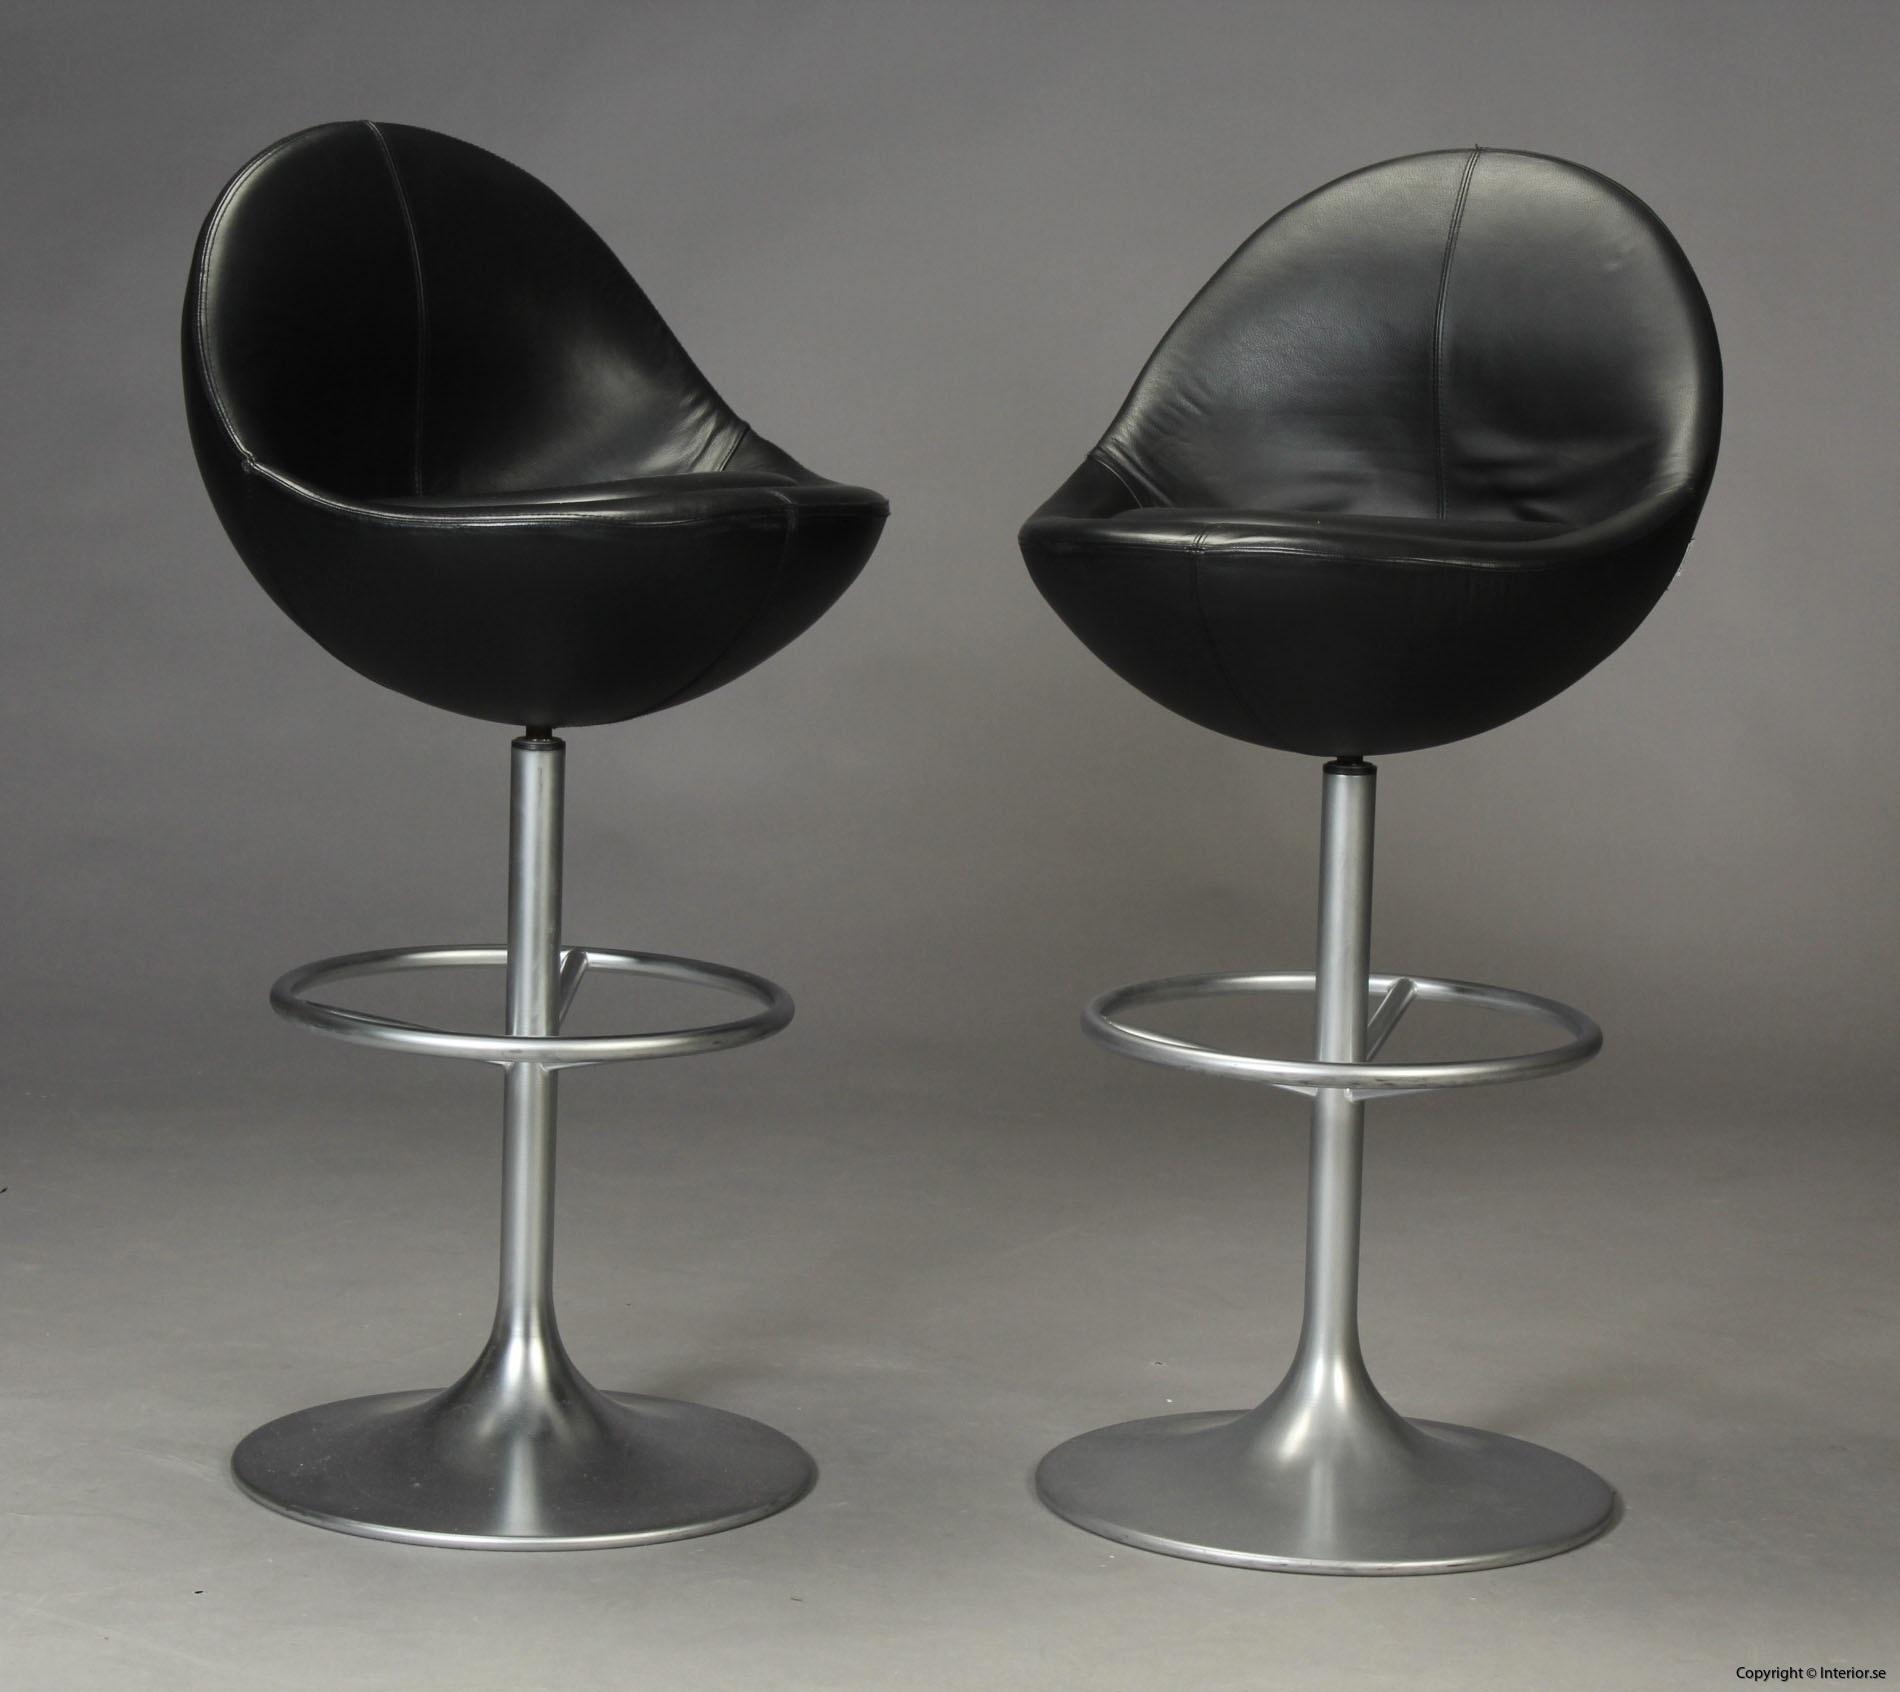 1 Johanson Design venus barstol (3)